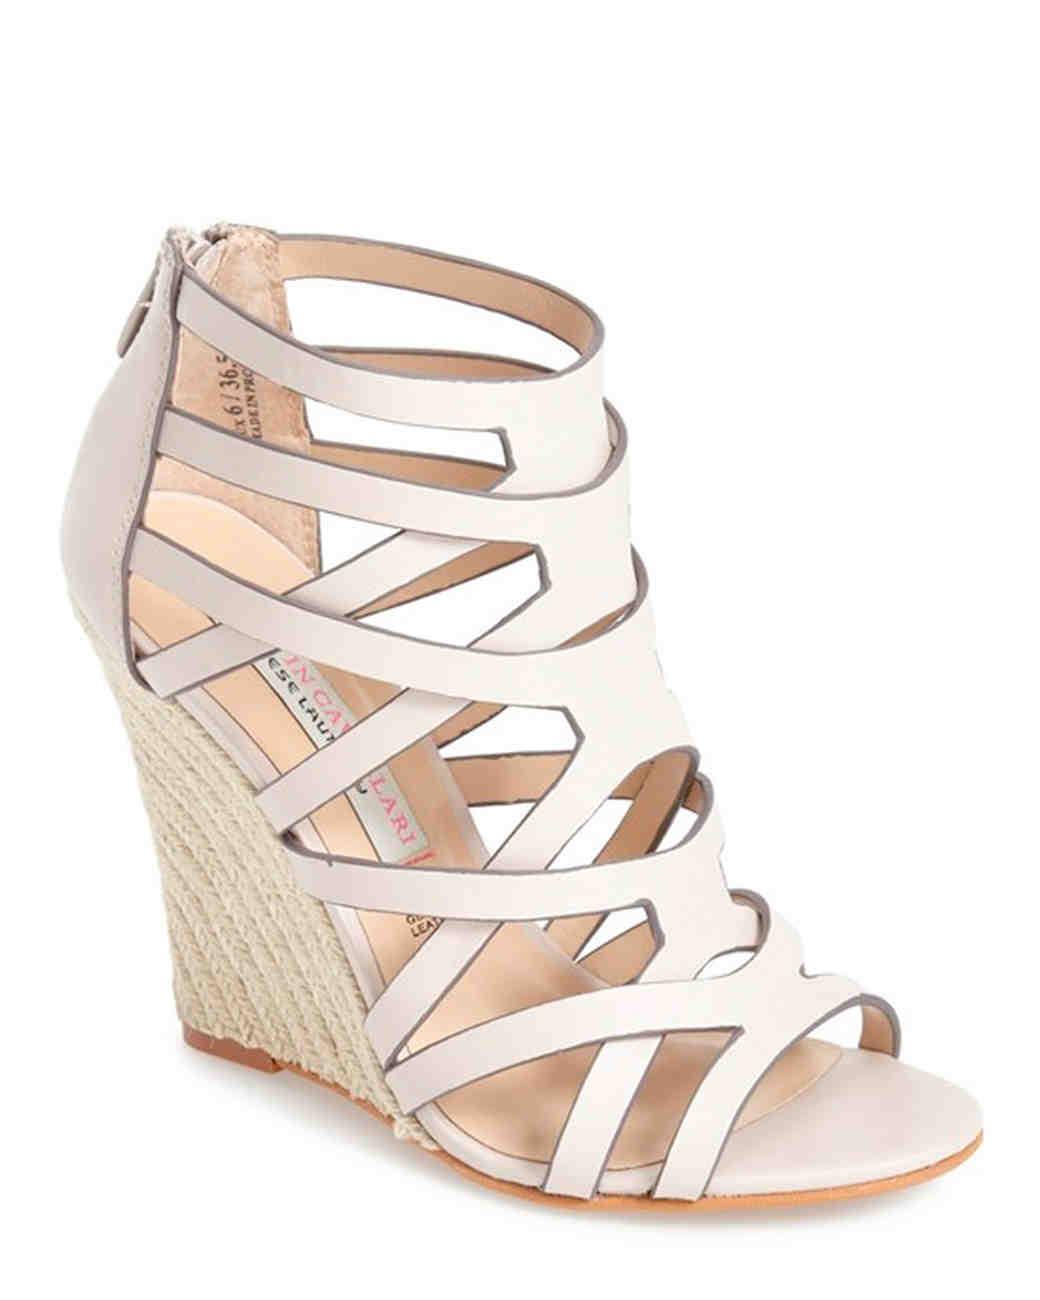 summer-wedding-shoes-kristin-cavallari-lux-esadrilles-0515.jpg